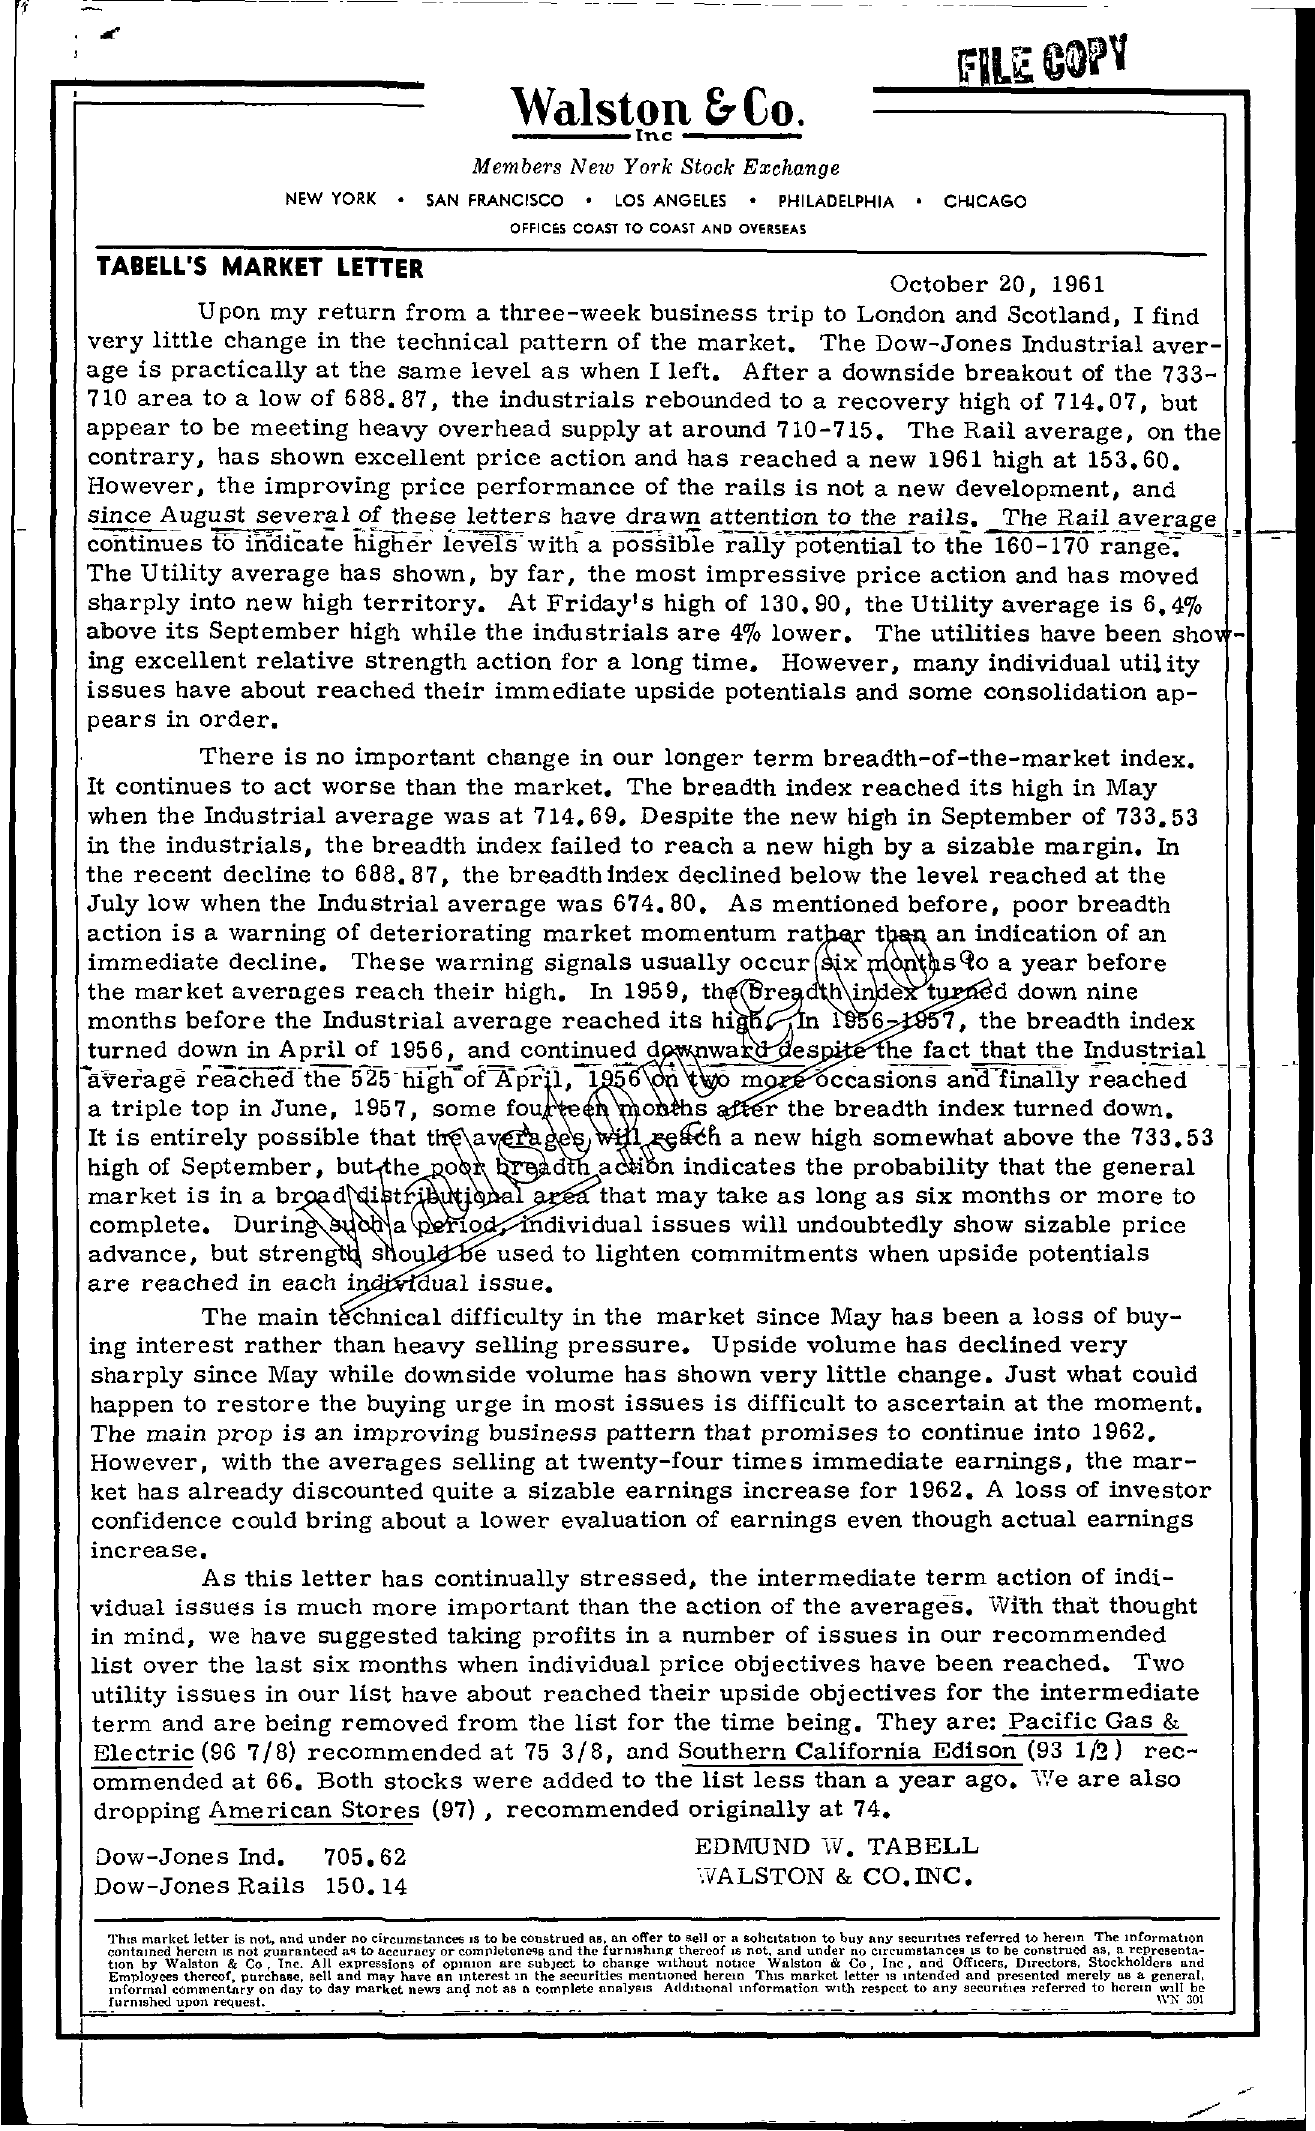 Tabell's Market Letter - October 20, 1961